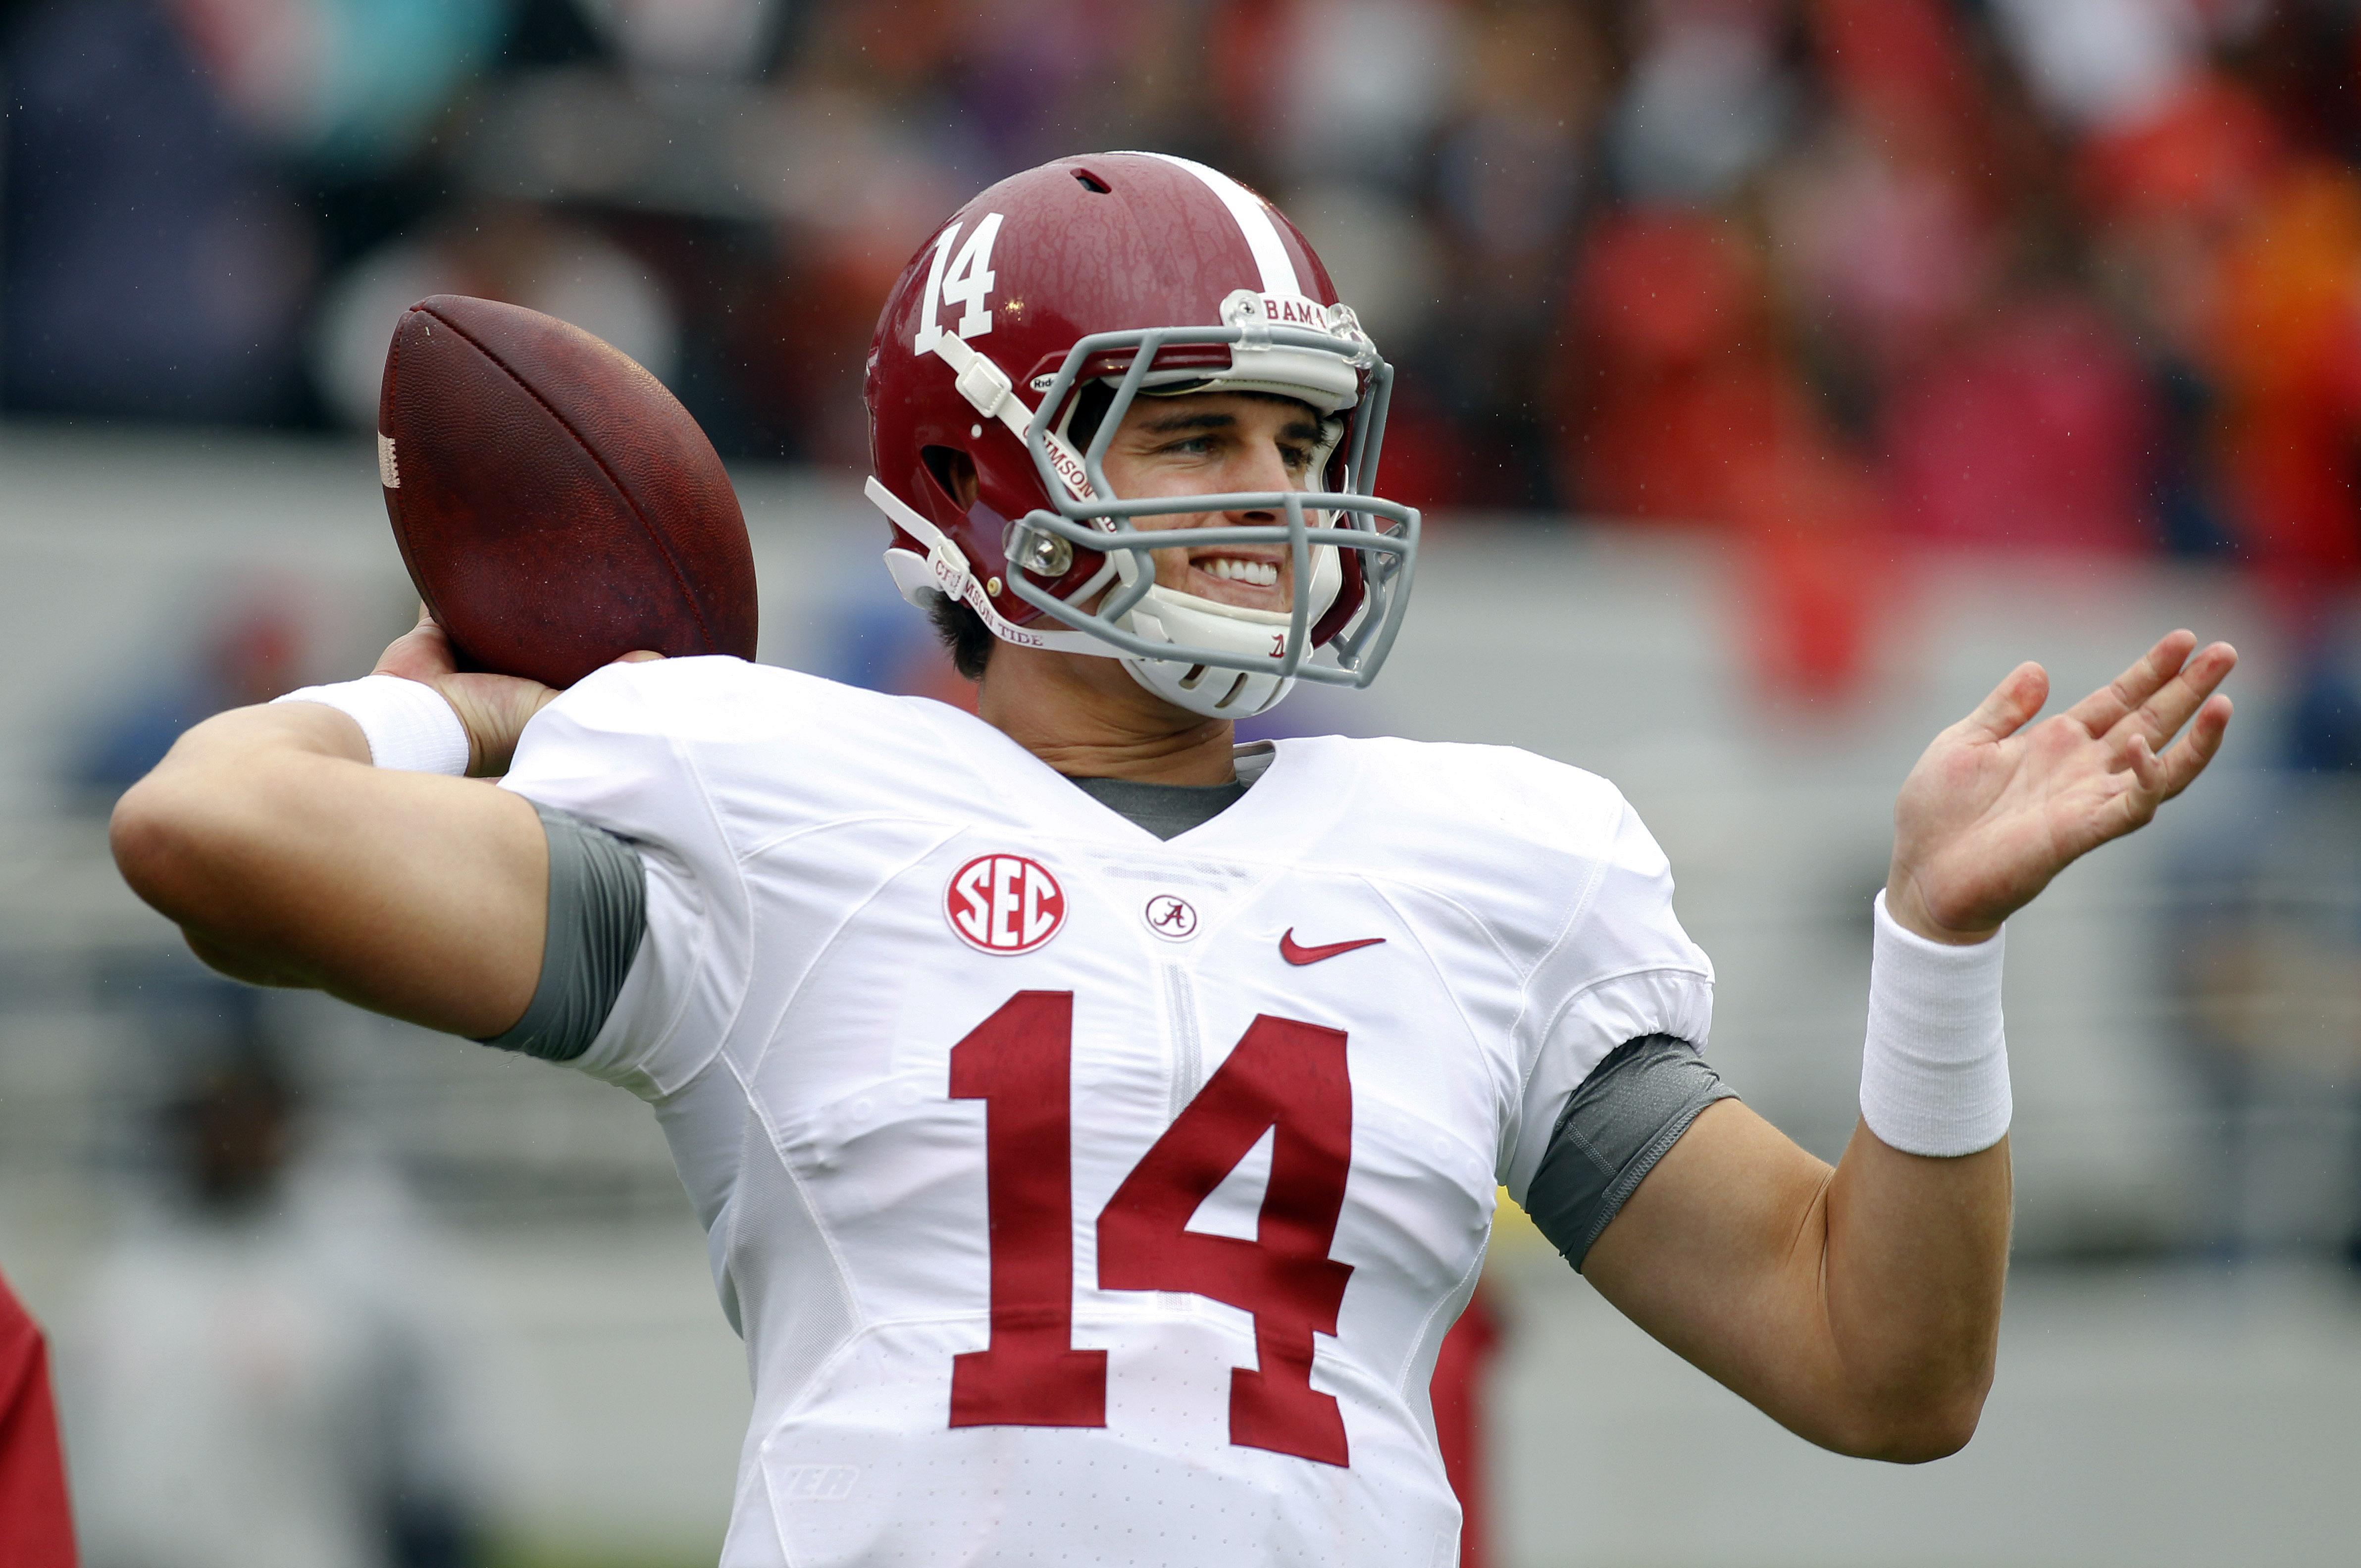 Alabama quarterback Jake Coker warms up before an NCAA college football game against Georgia, Saturday, Oct. 3, 2015, in Athens, Ga. (AP Photo/Brett Davis)